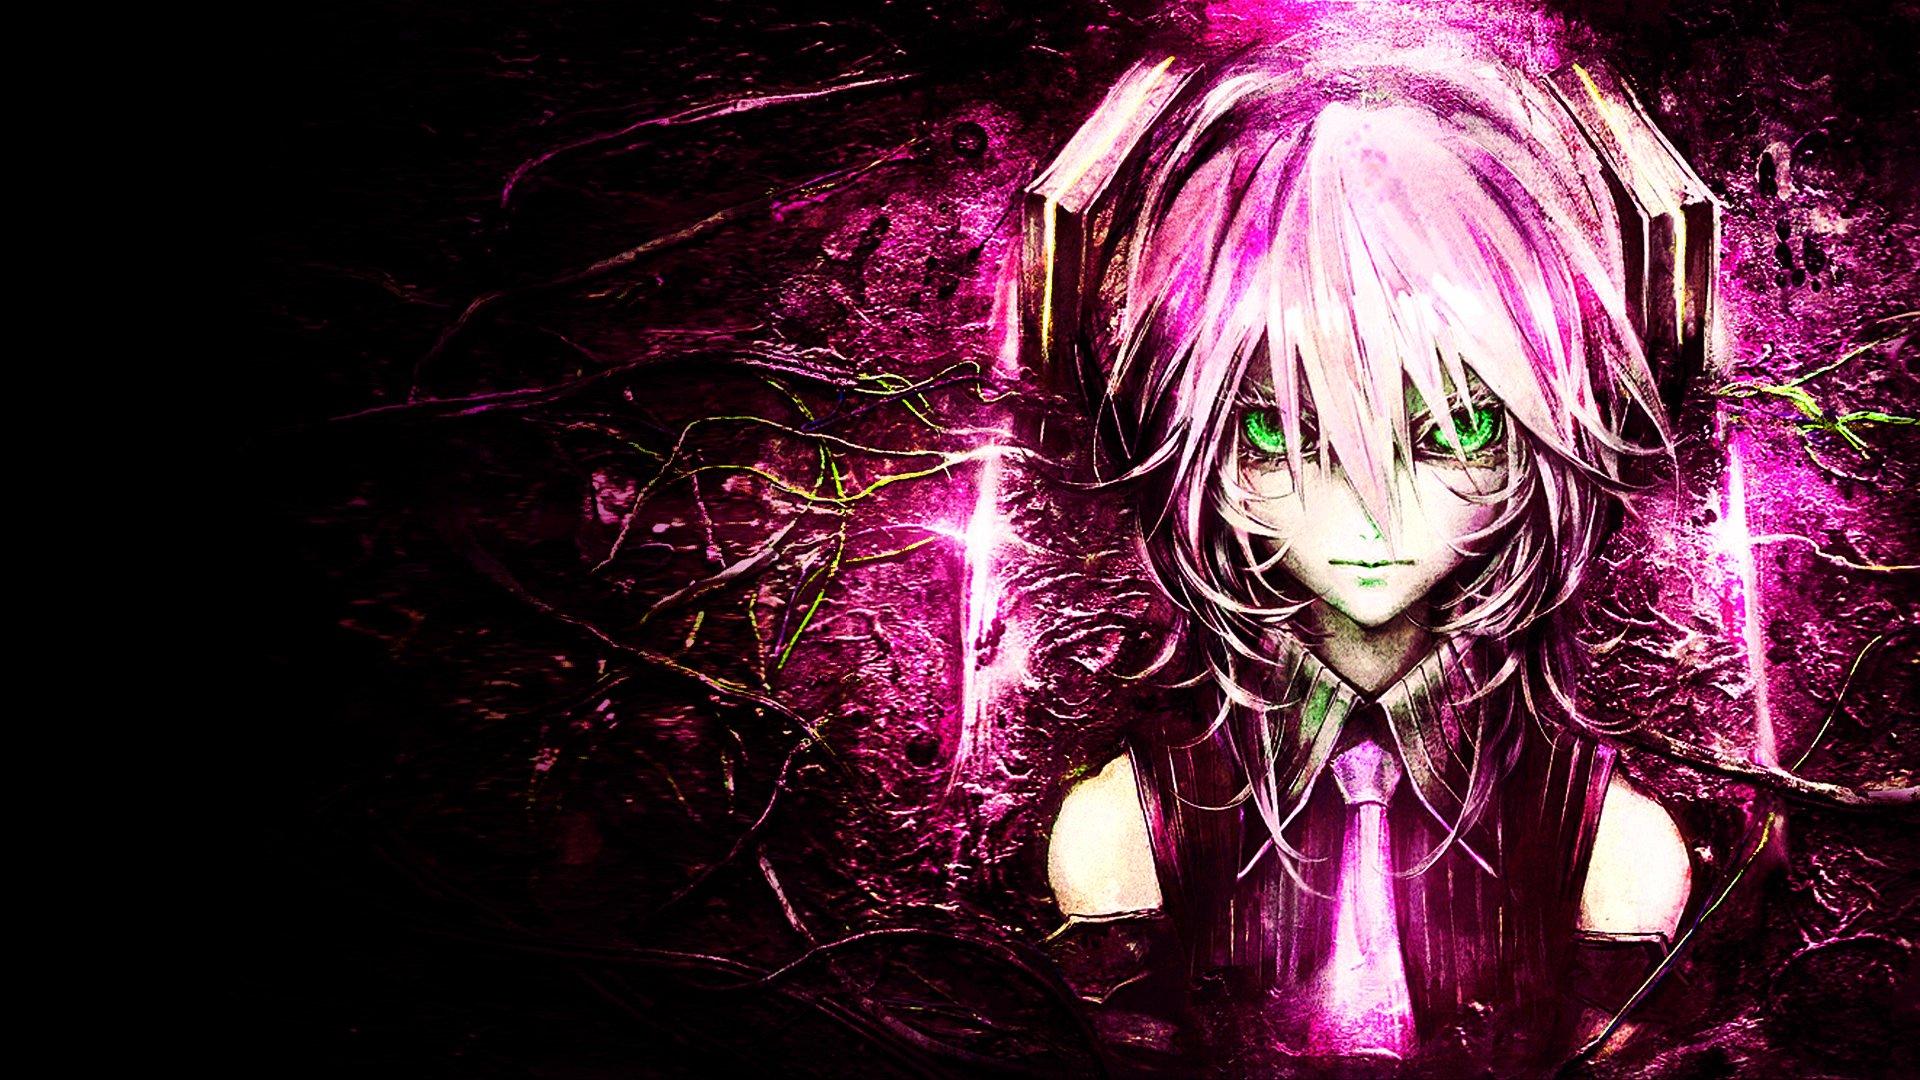 动漫 - Vocaloid  Hatsune Miku Pink Pink Hair Green Eyes 动漫 壁纸